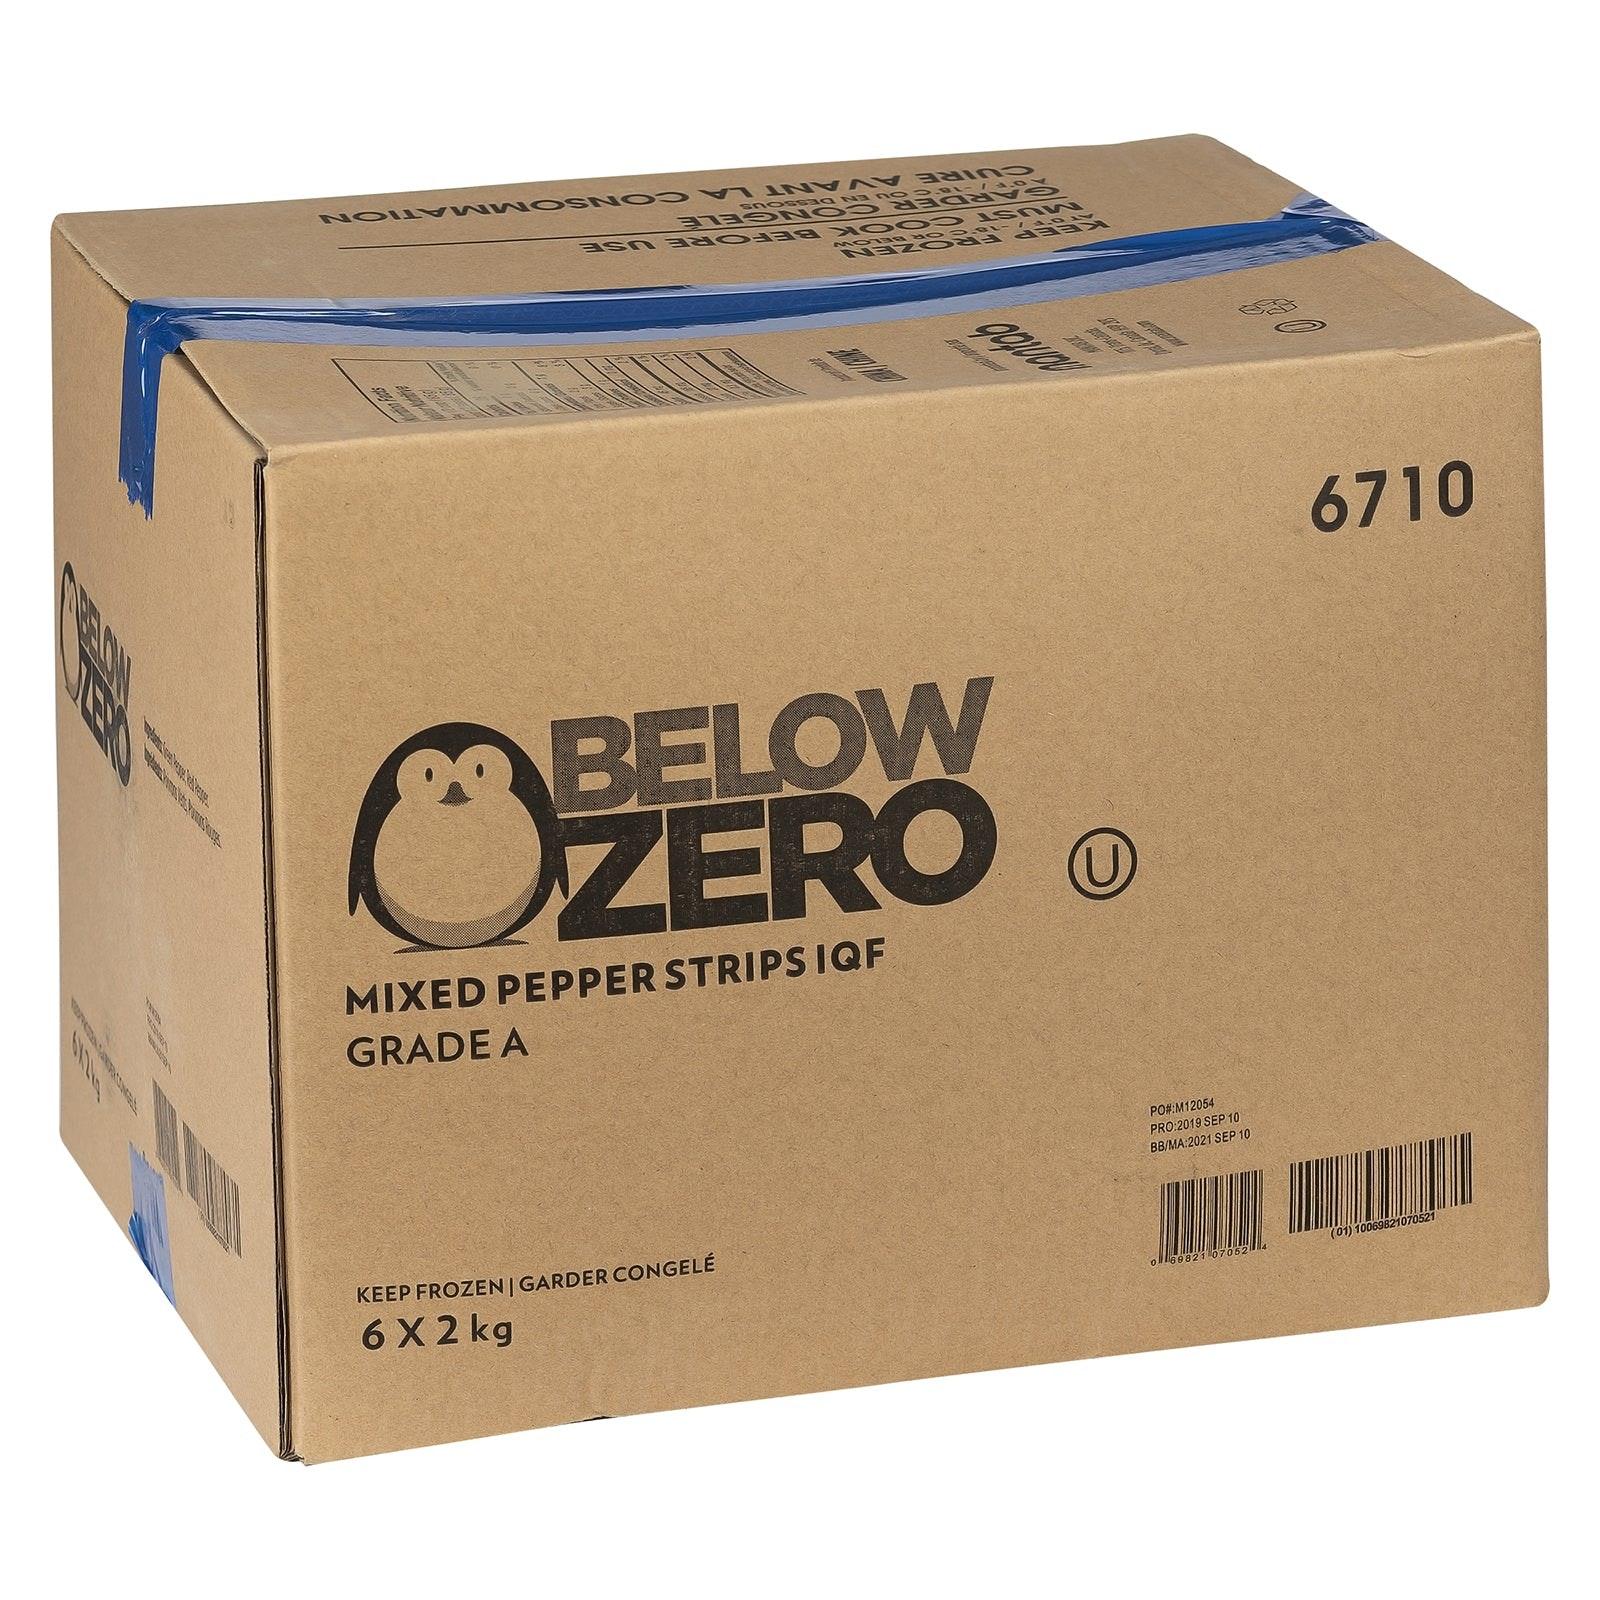 BELOW ZERO Mixed pepper strips